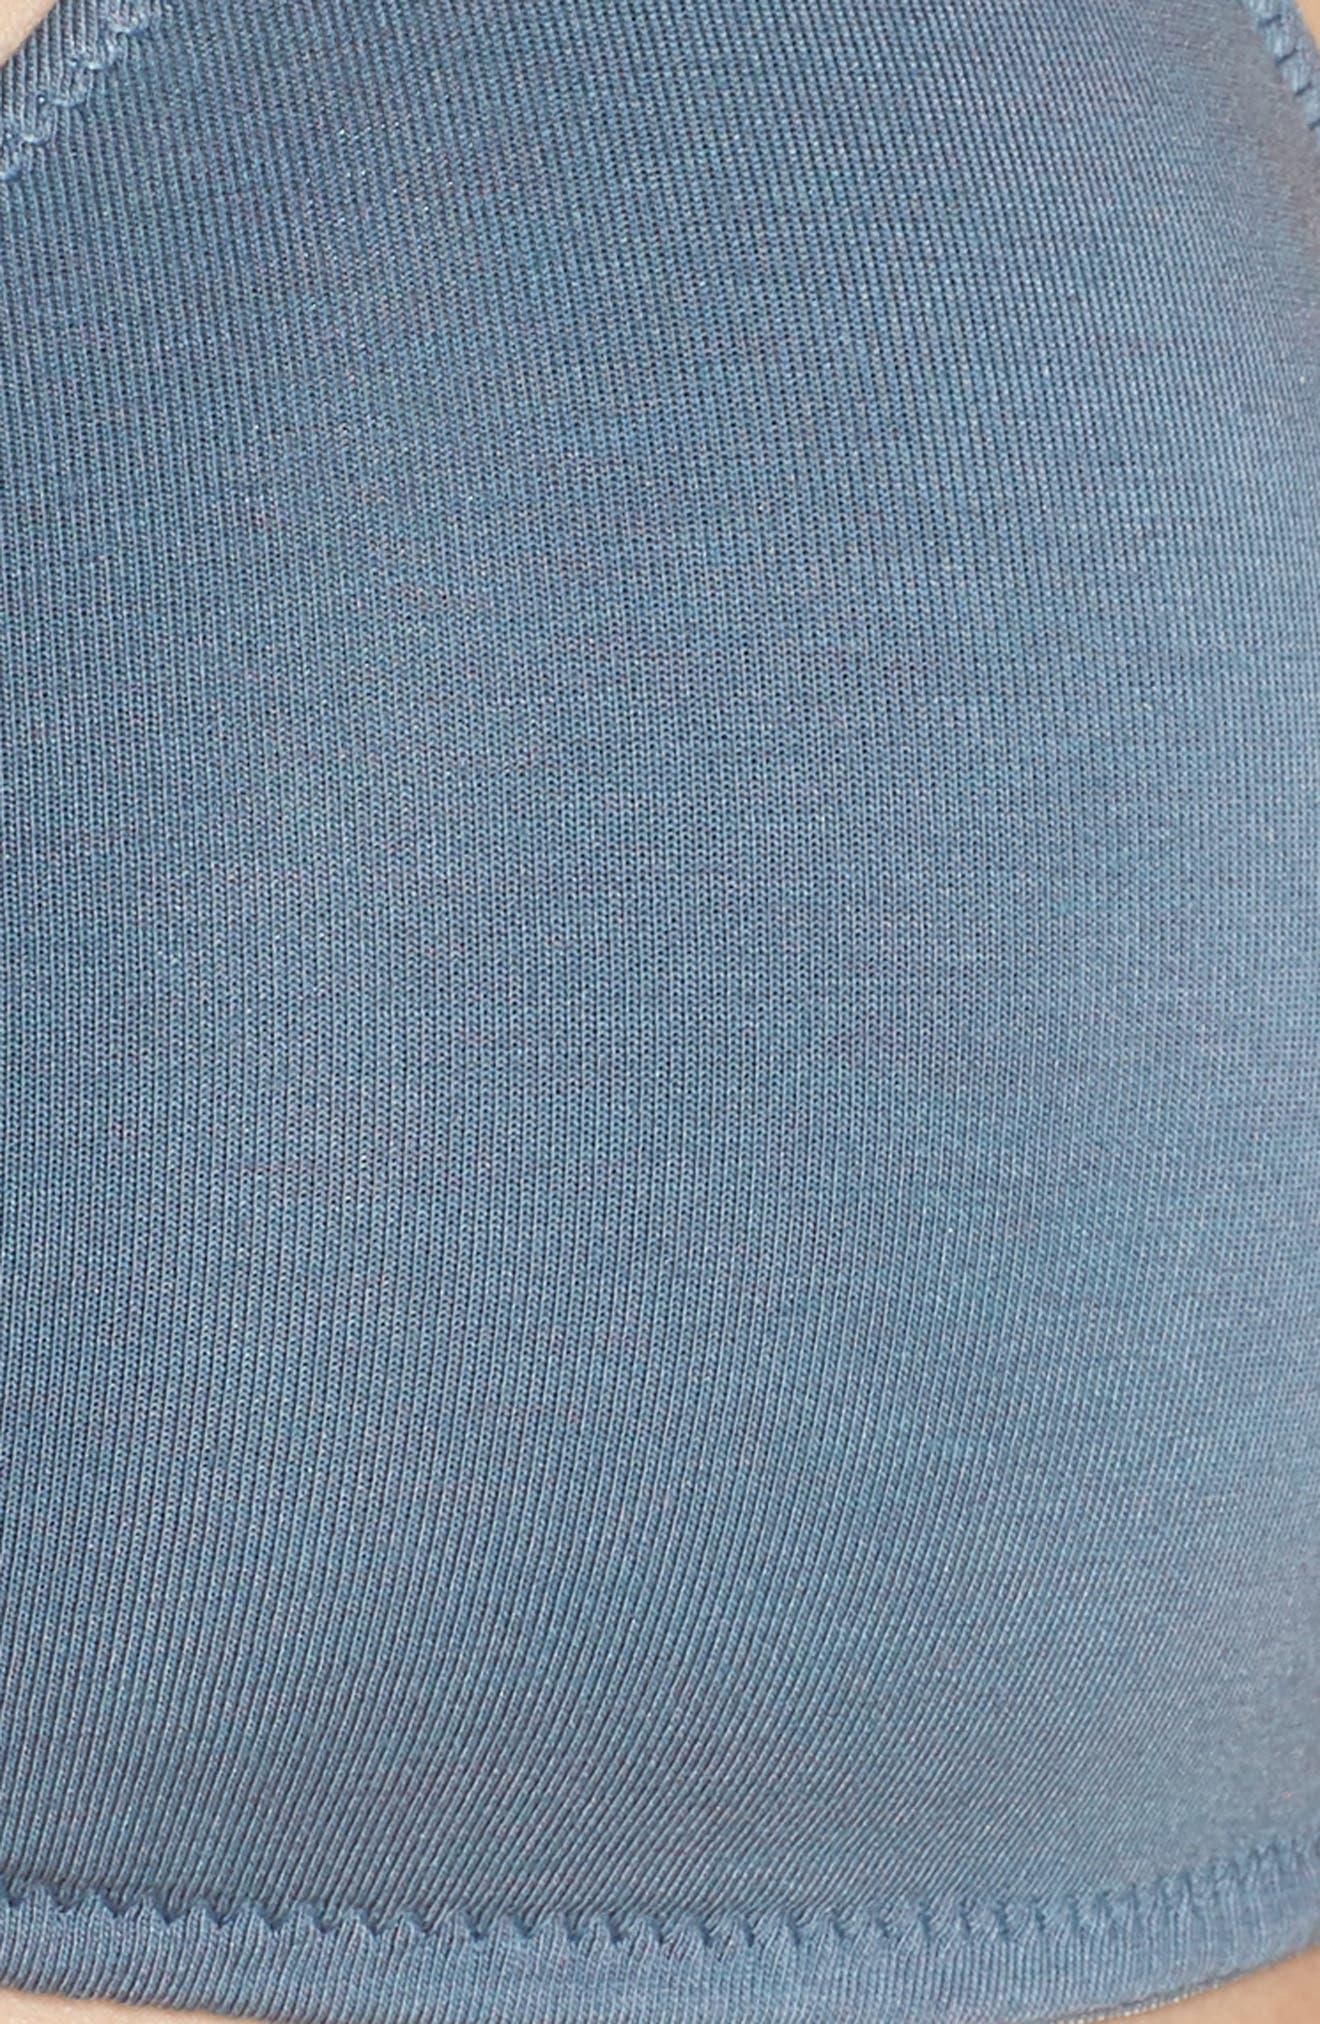 Knit Bralette,                             Alternate thumbnail 6, color,                             DEEP RIVER